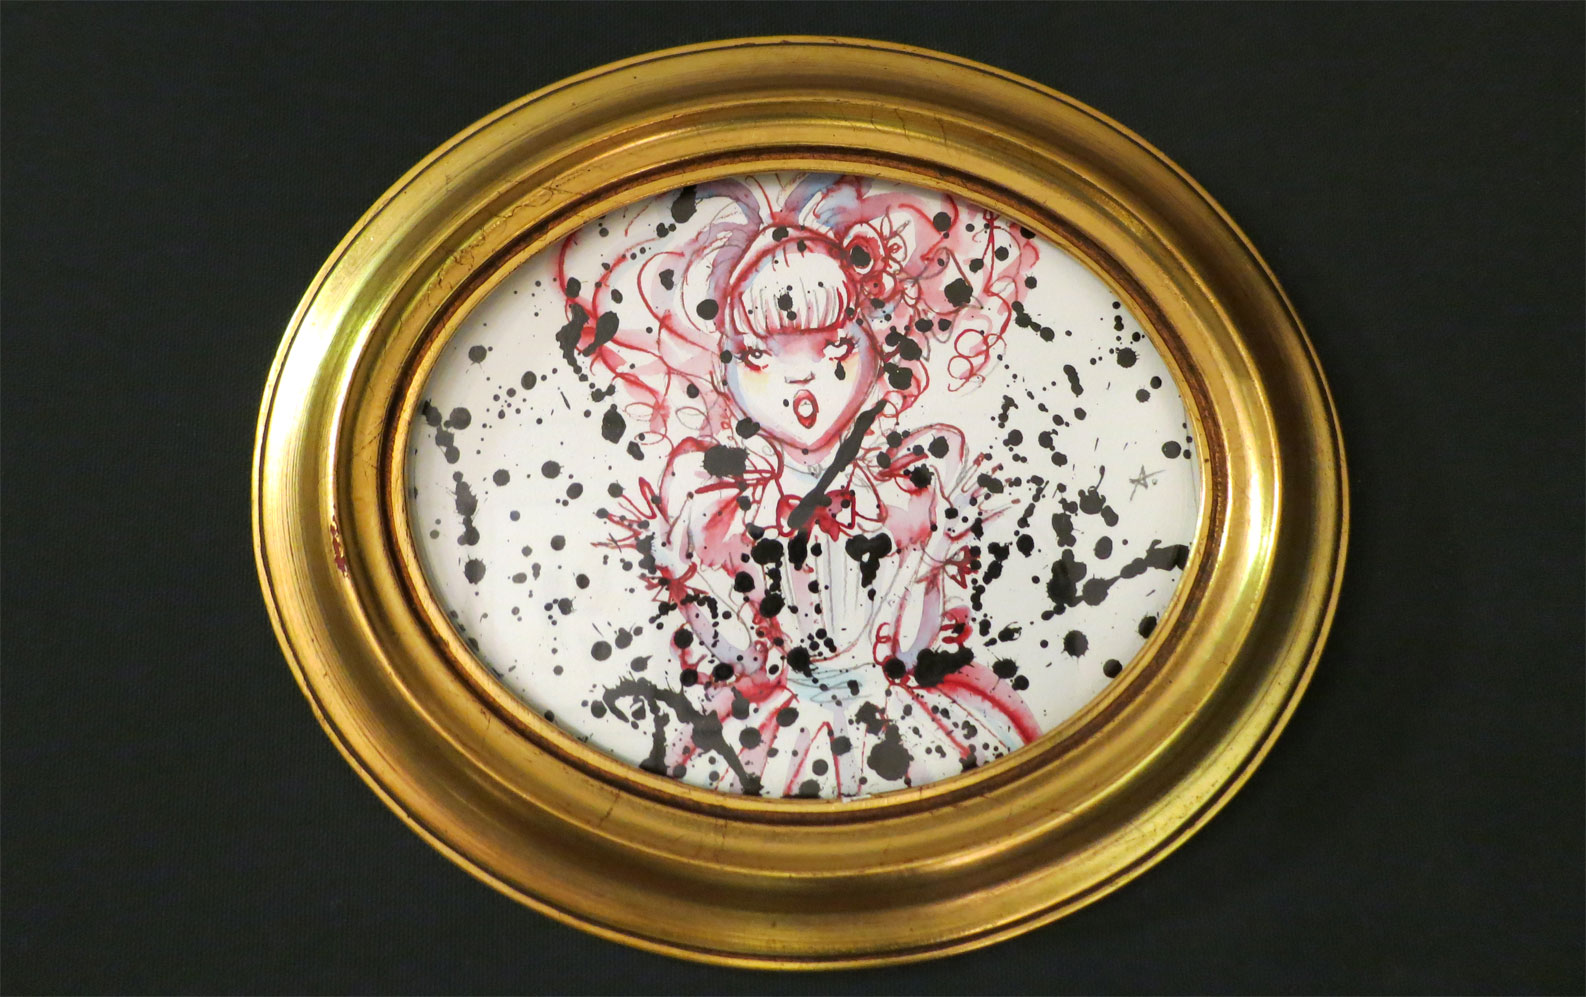 Marie Nipponnette + Pollock